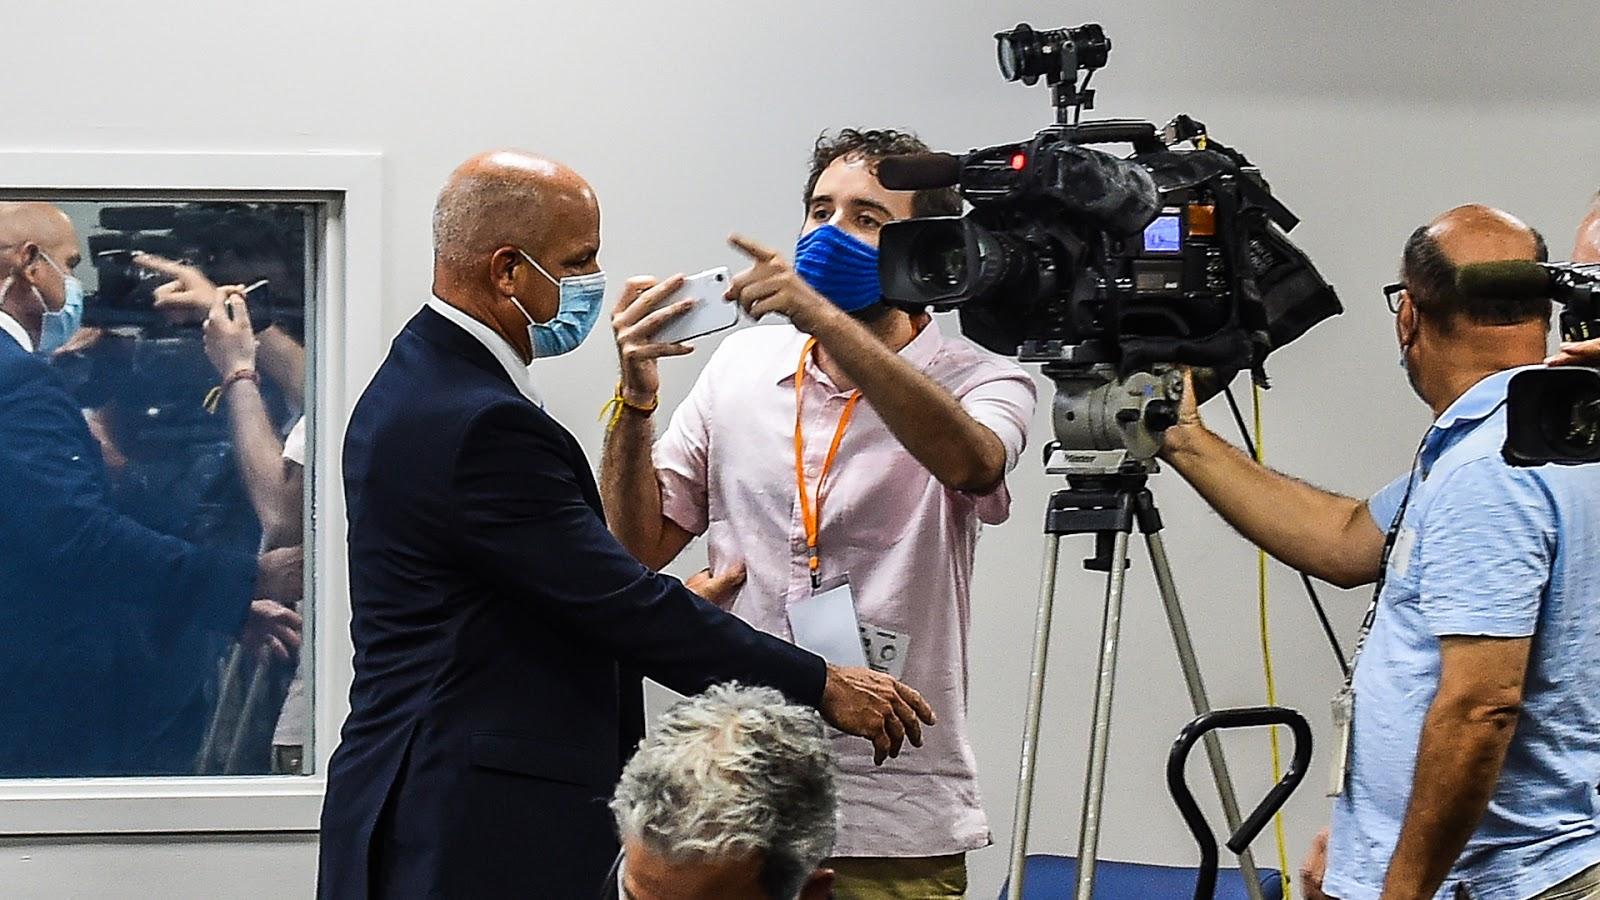 Un argentino increpó al gobernador de Florida